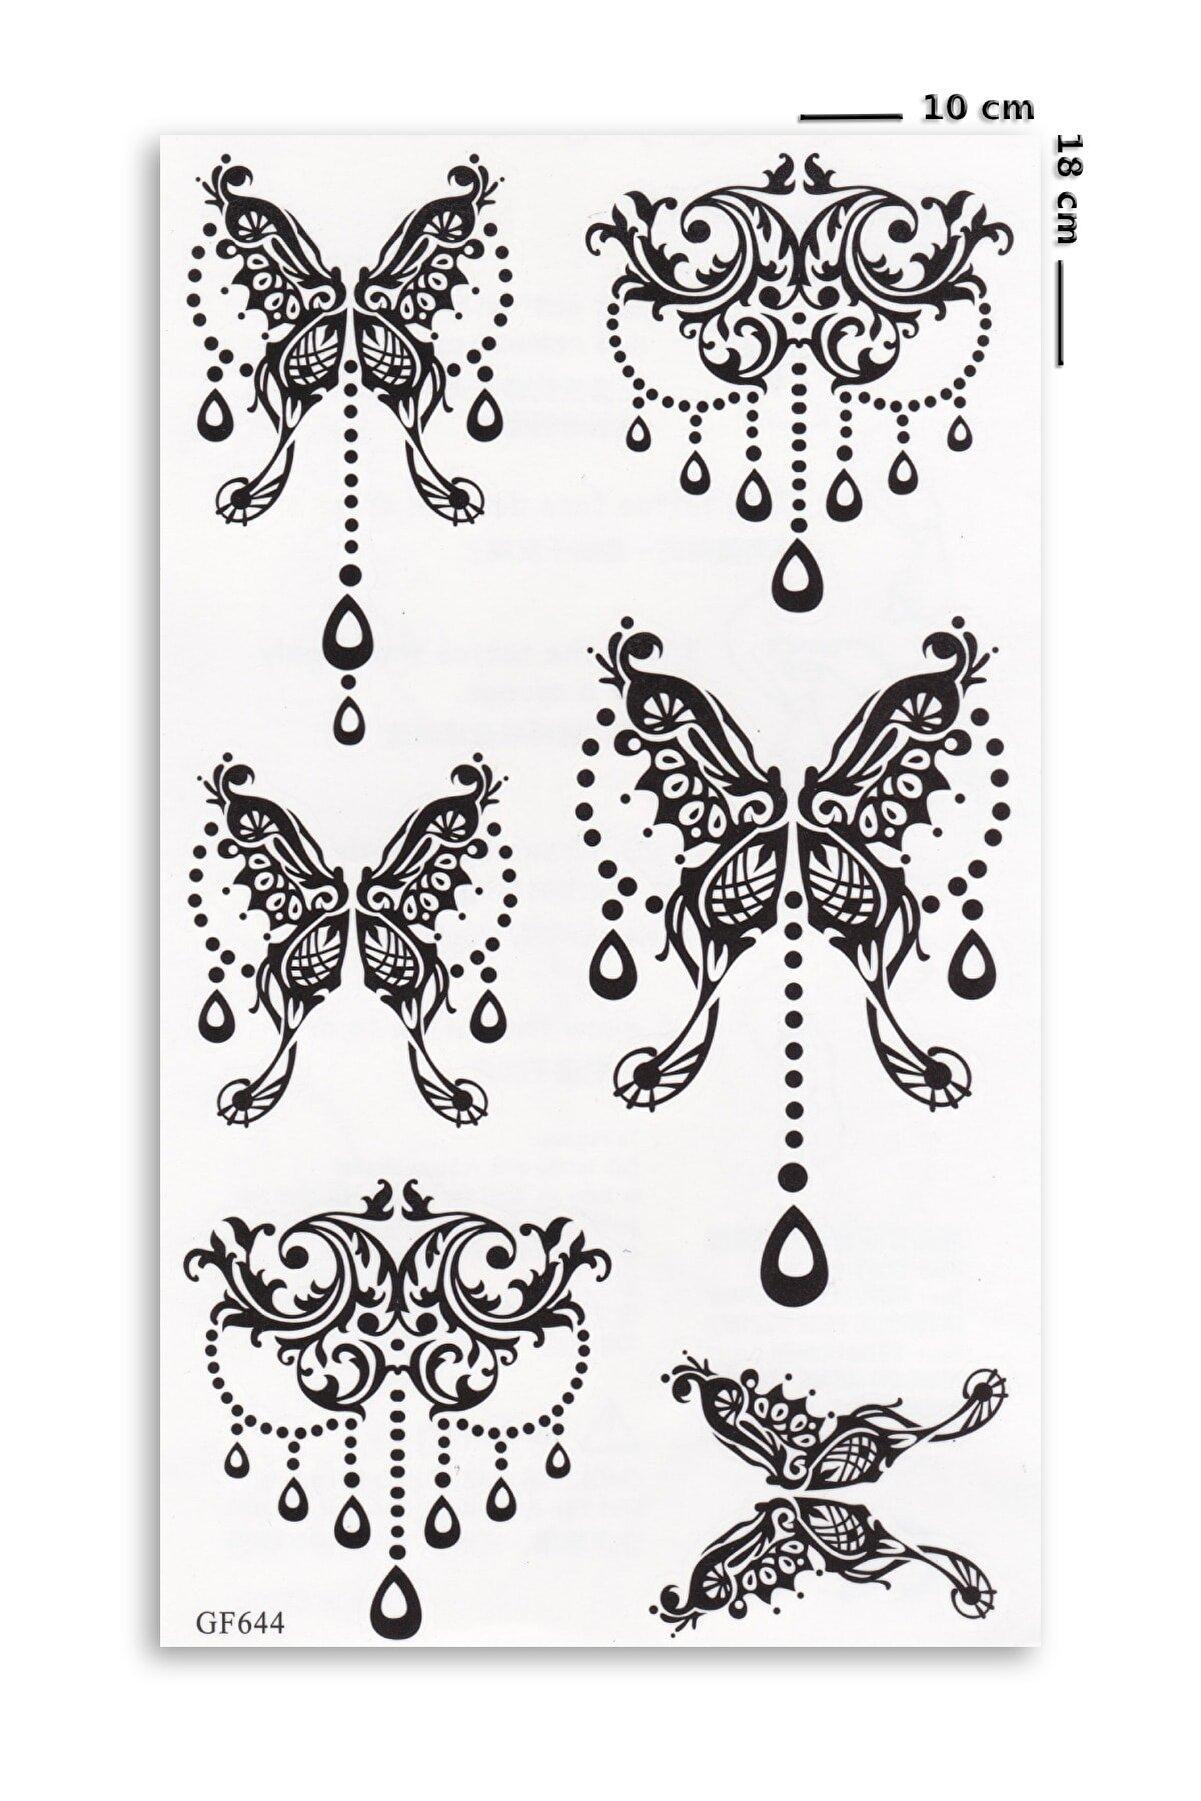 BP Tattoo Gotik Kelebek Dövmesi